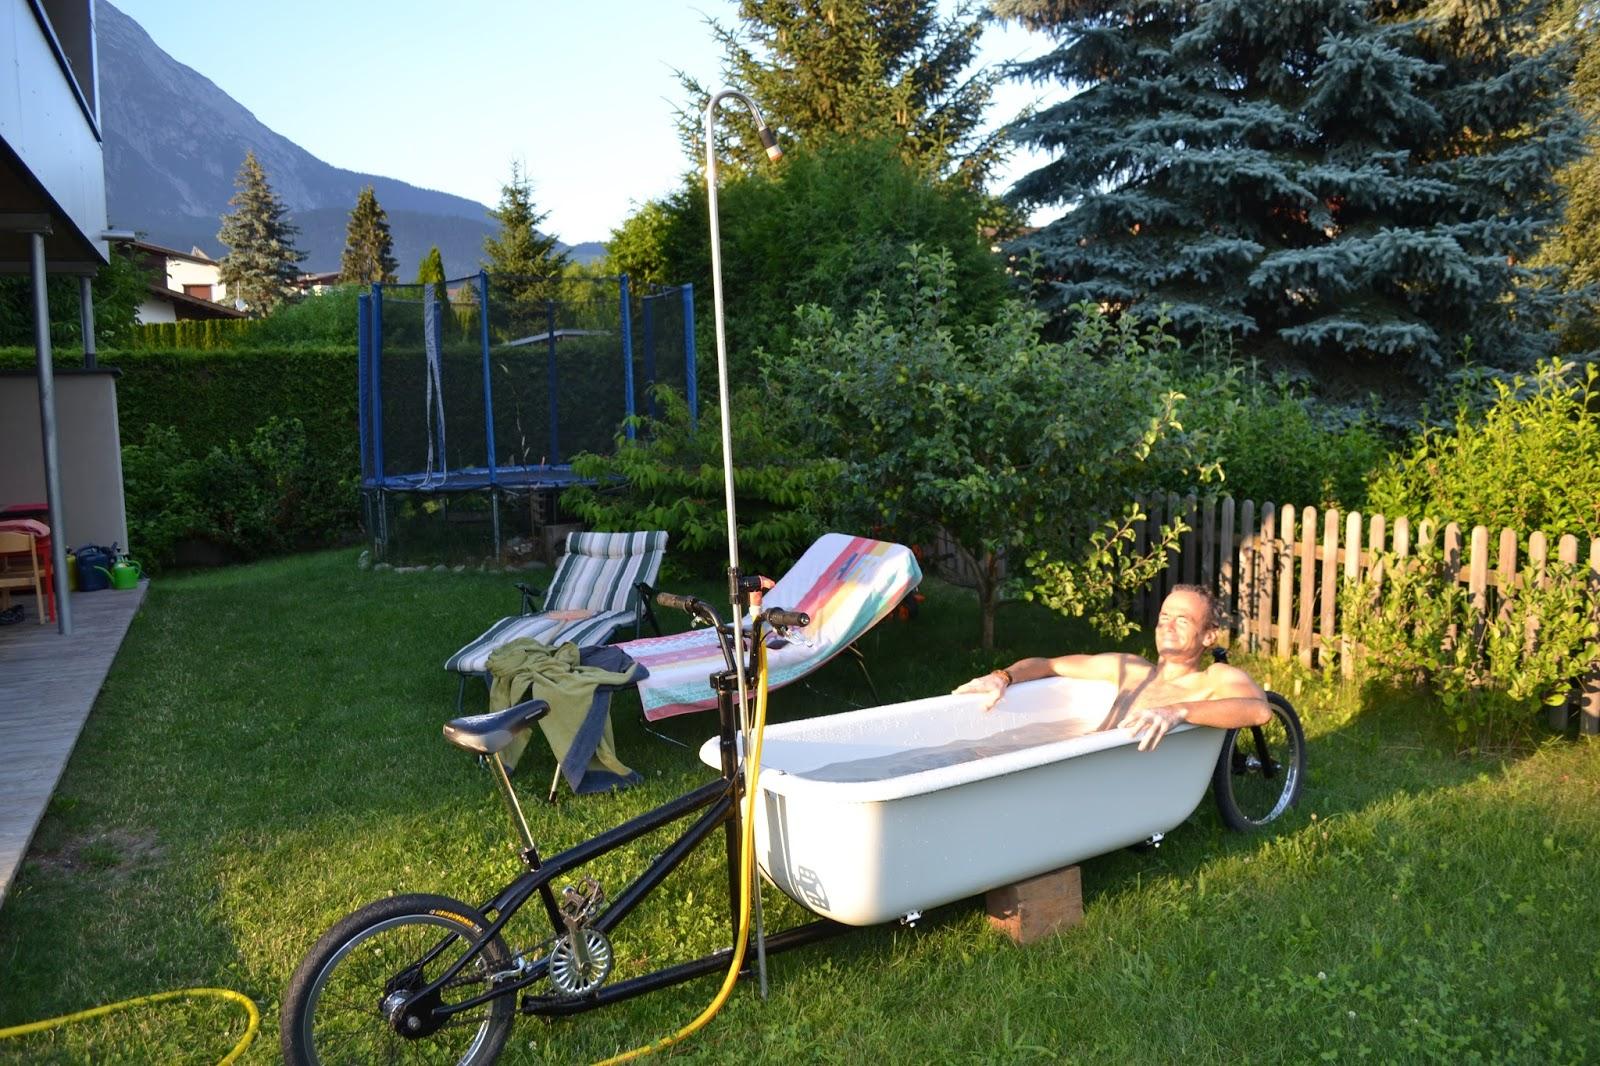 cargobikelane summer fun when a diy longjohn cargo bike meets a